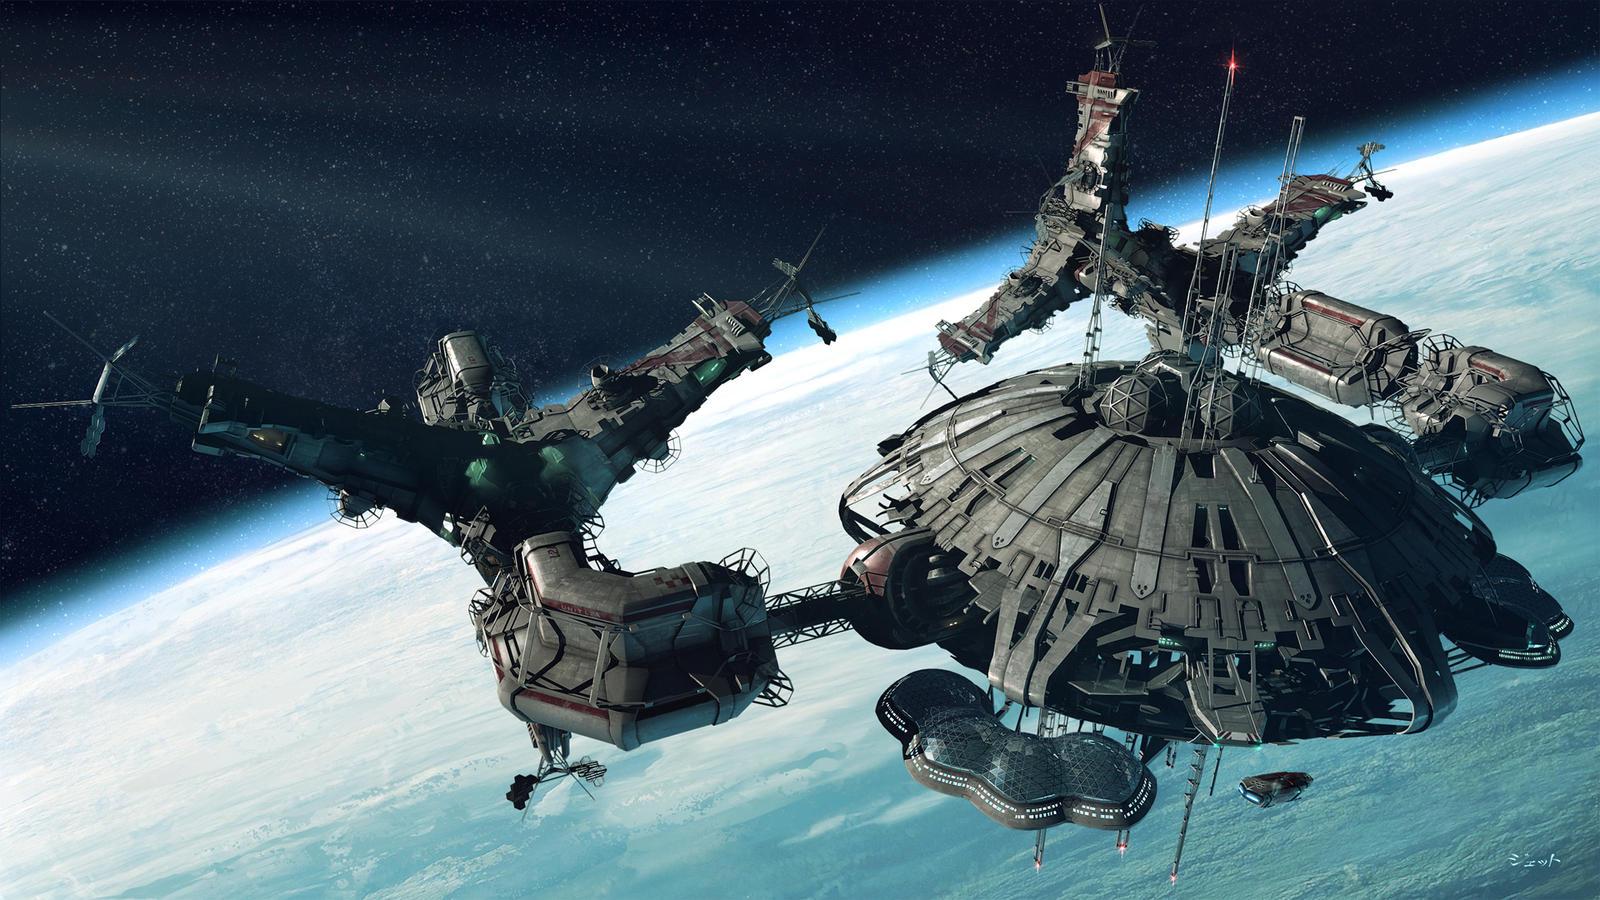 space station by Jett0 on DeviantArt